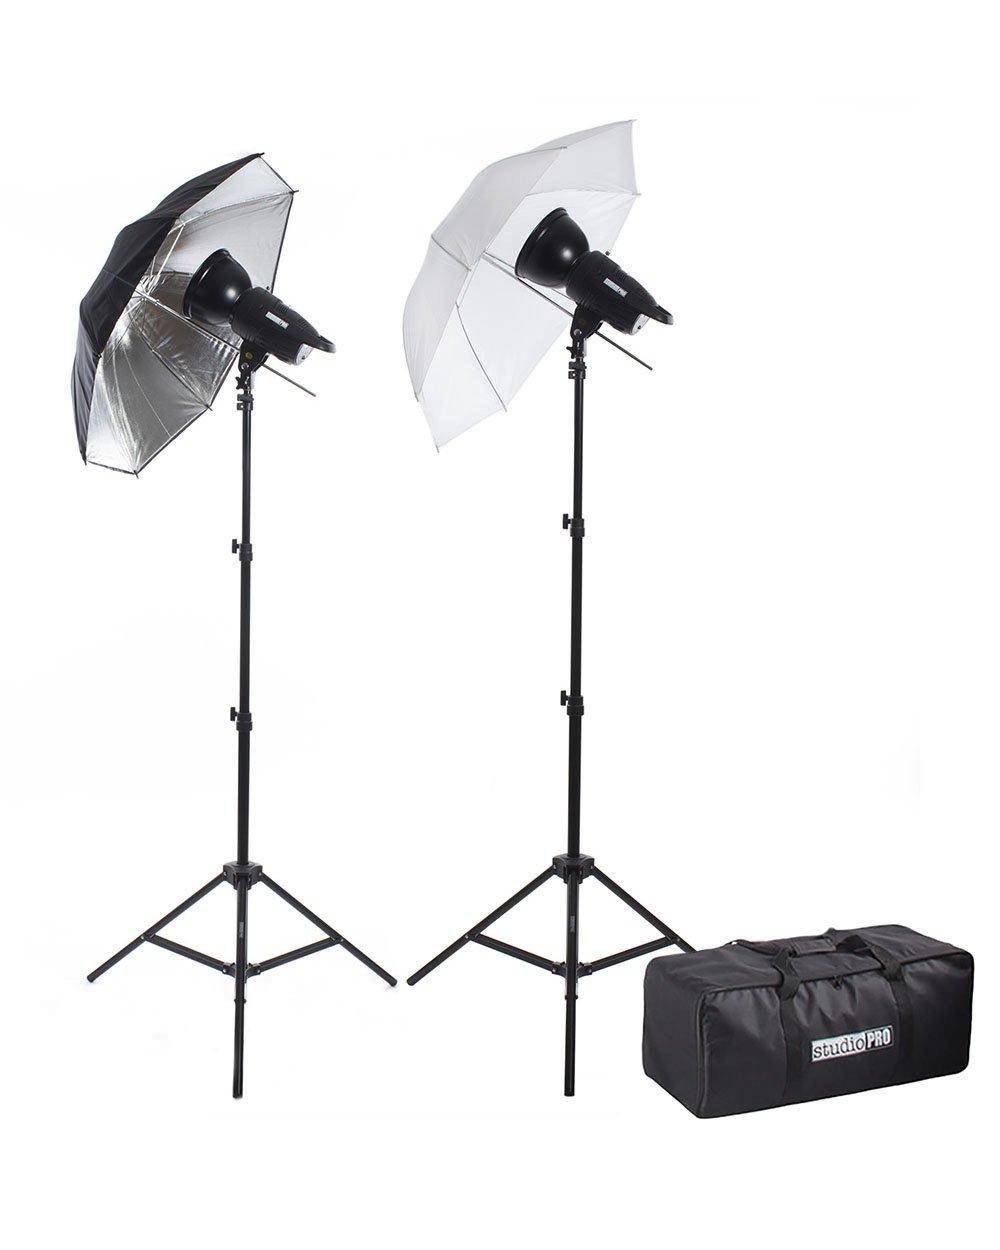 Fovitec StudioPRO 200W/s Two Strobe Monolight 33'' Umbrella Photo Kit & Carrying Case by Fovitec